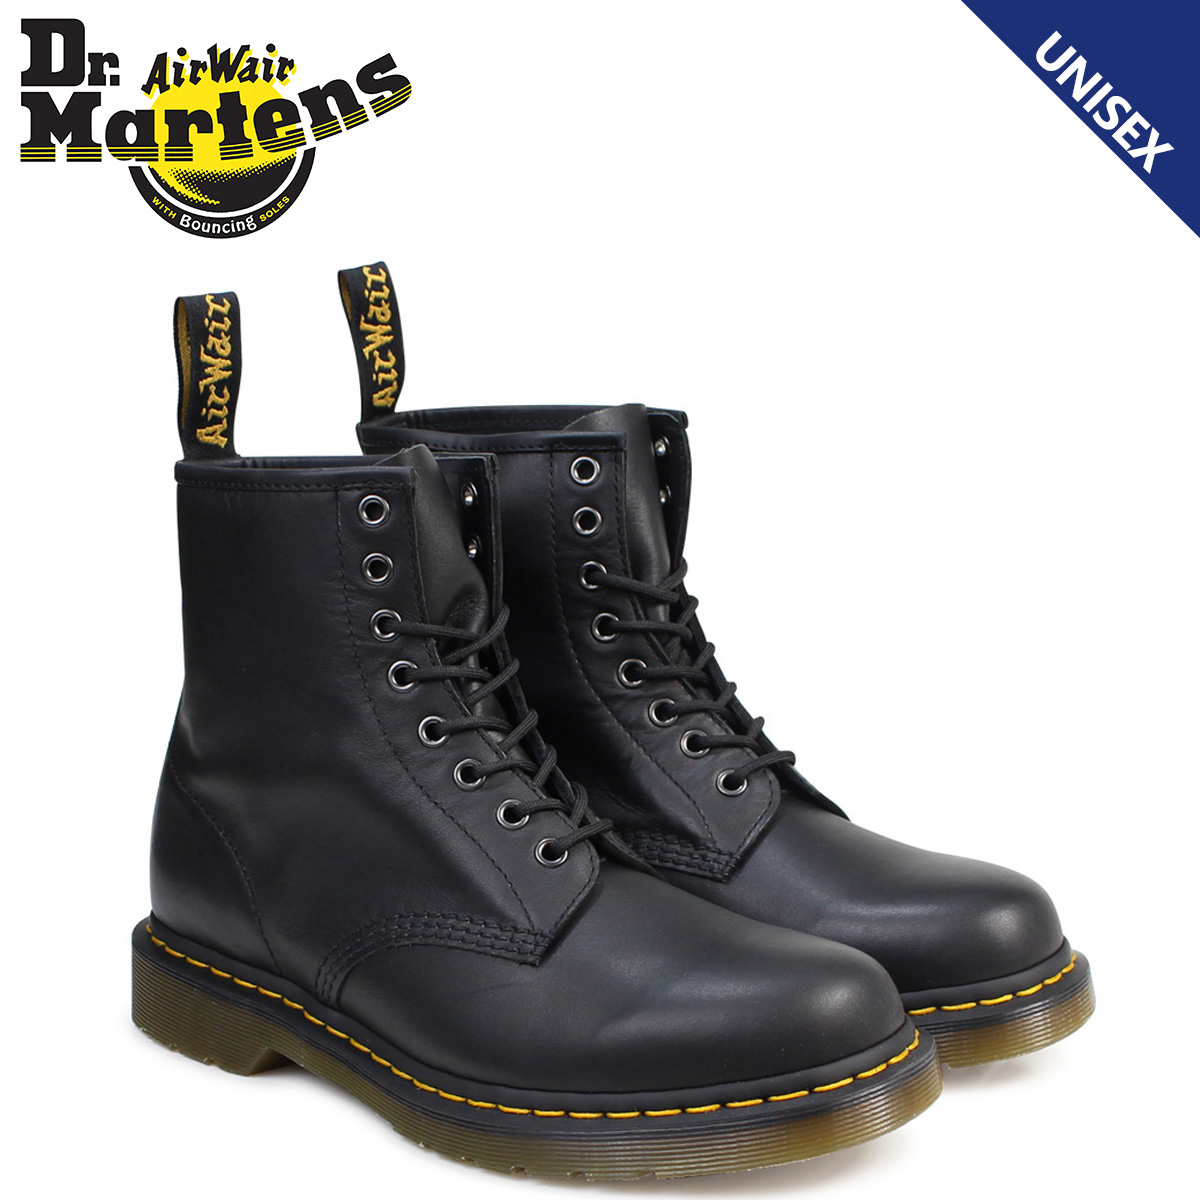 Dr.Martens ドクターマーチン 1460 8ホール ブーツ 8EYE BOOT R11822002 メンズ レディース